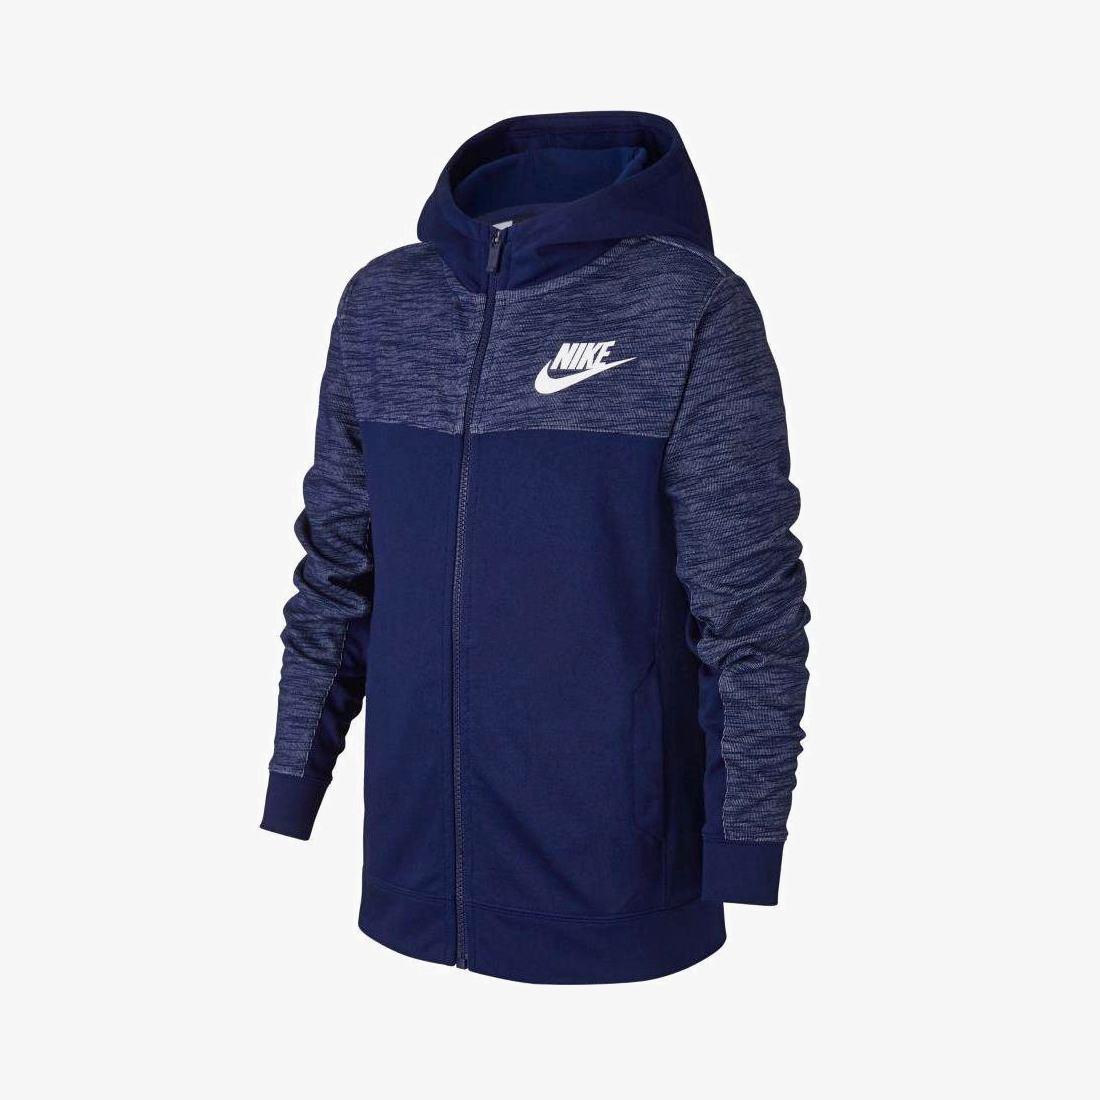 nike b nsw hoodie fz advance